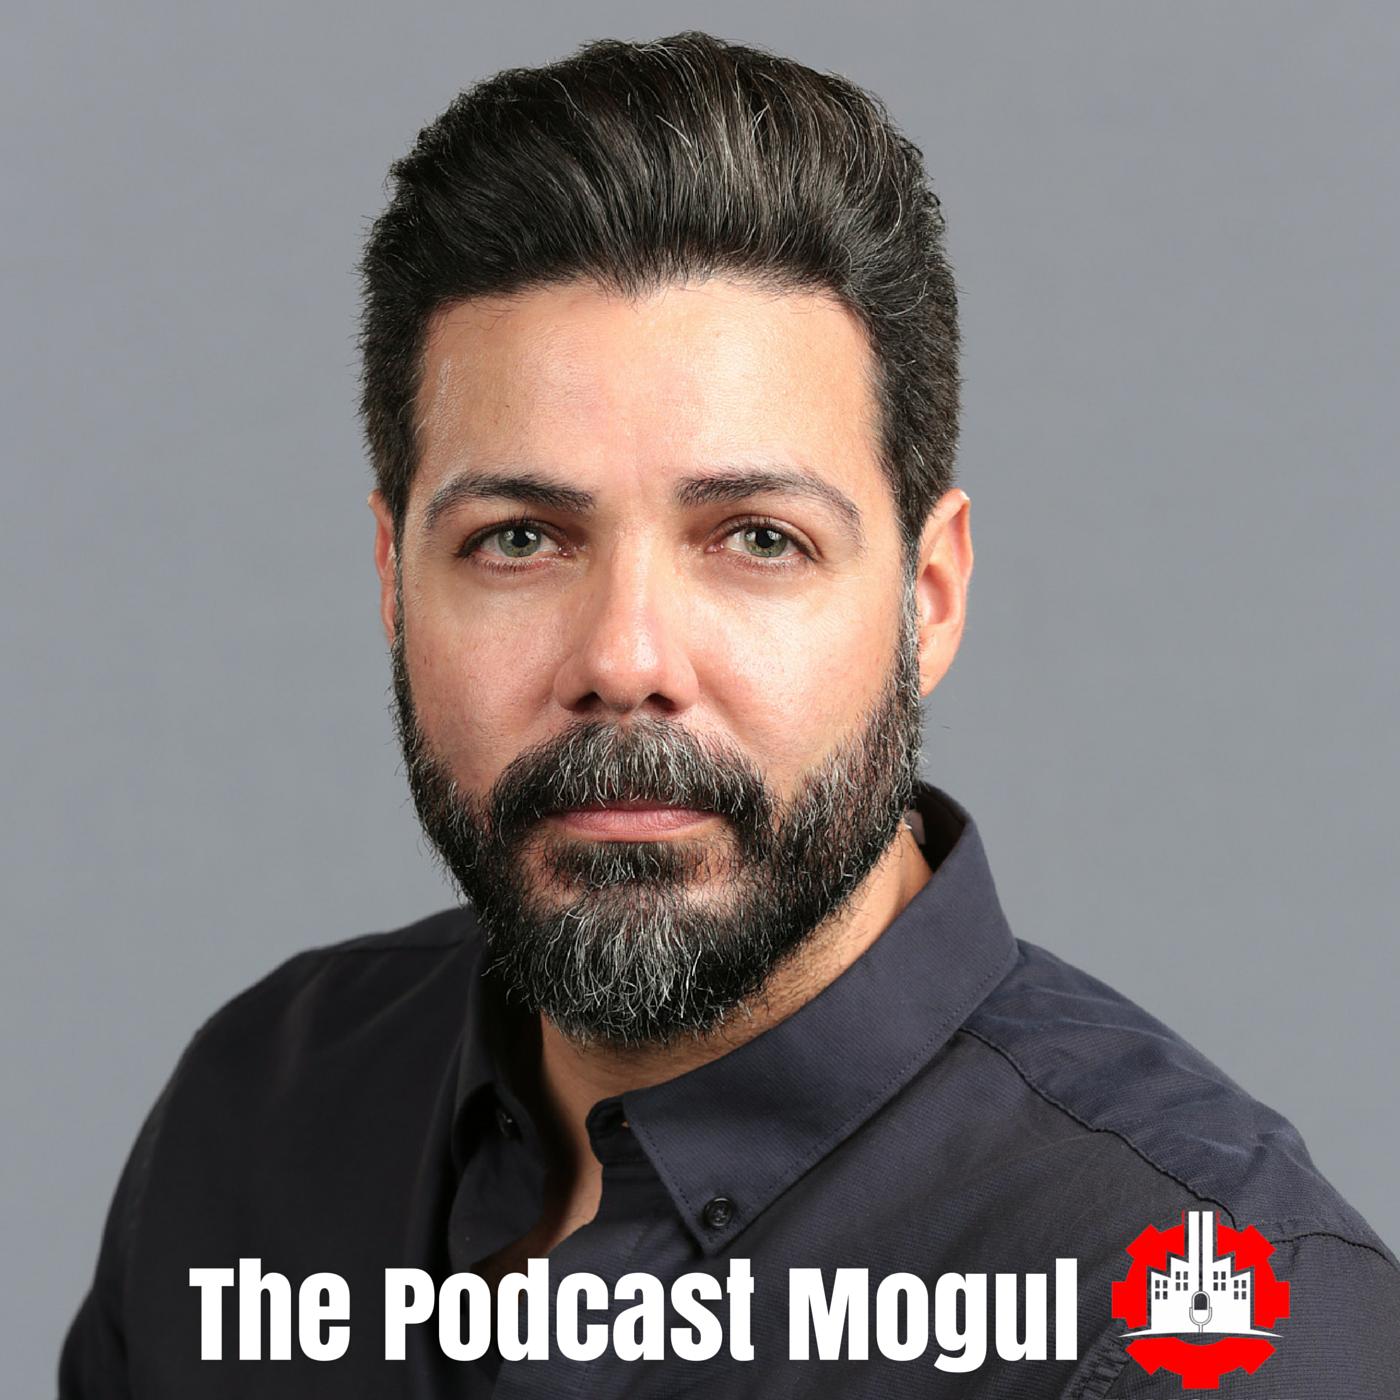 Producer Jonathan - Podcast Mogul